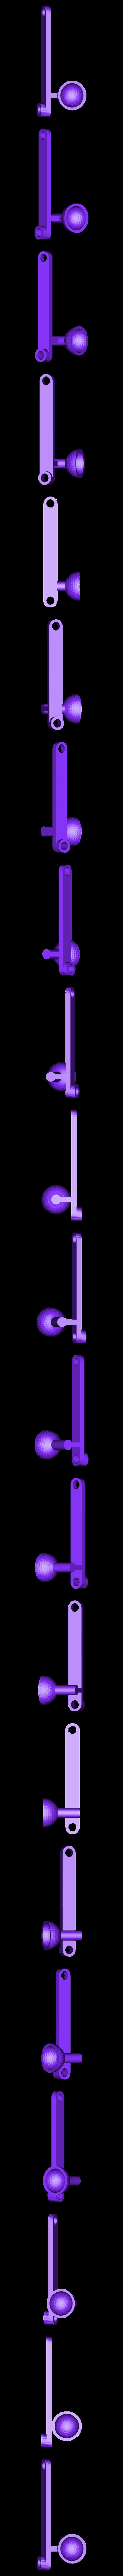 Arm_Right.stl Download free STL file Fingerdigger • Design to 3D print, Zippityboomba